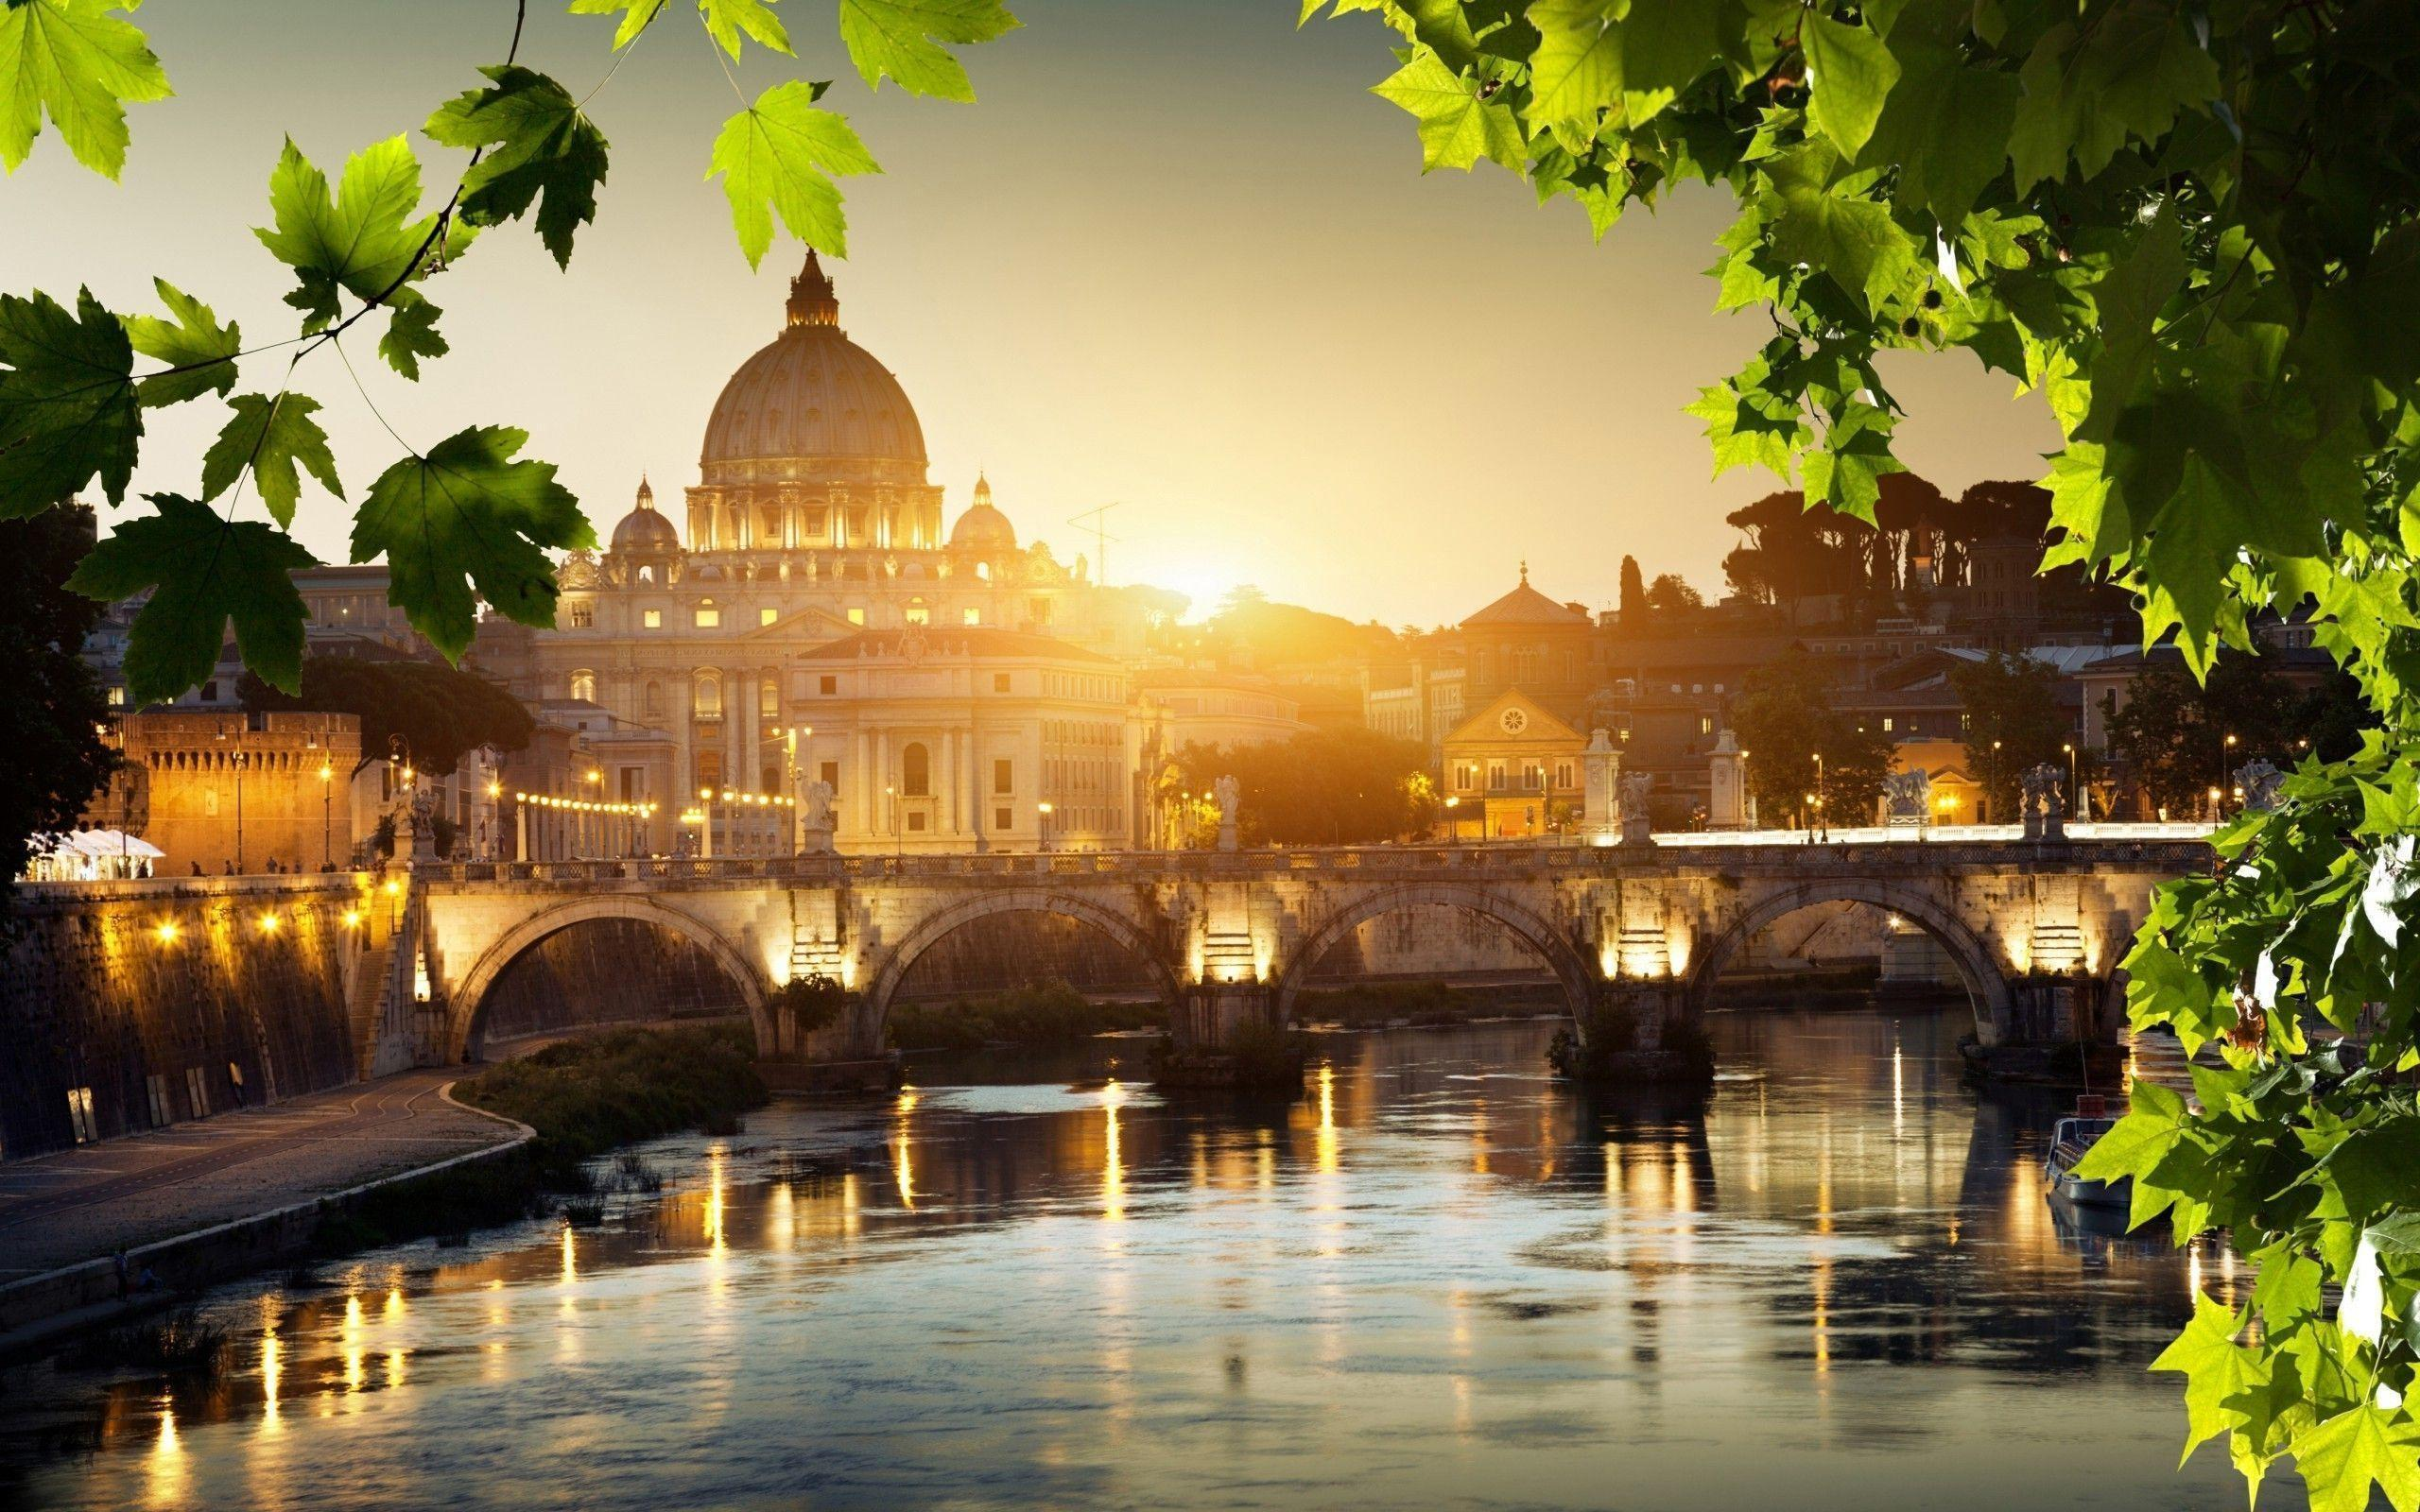 vatican wallpapers travel world - photo #20